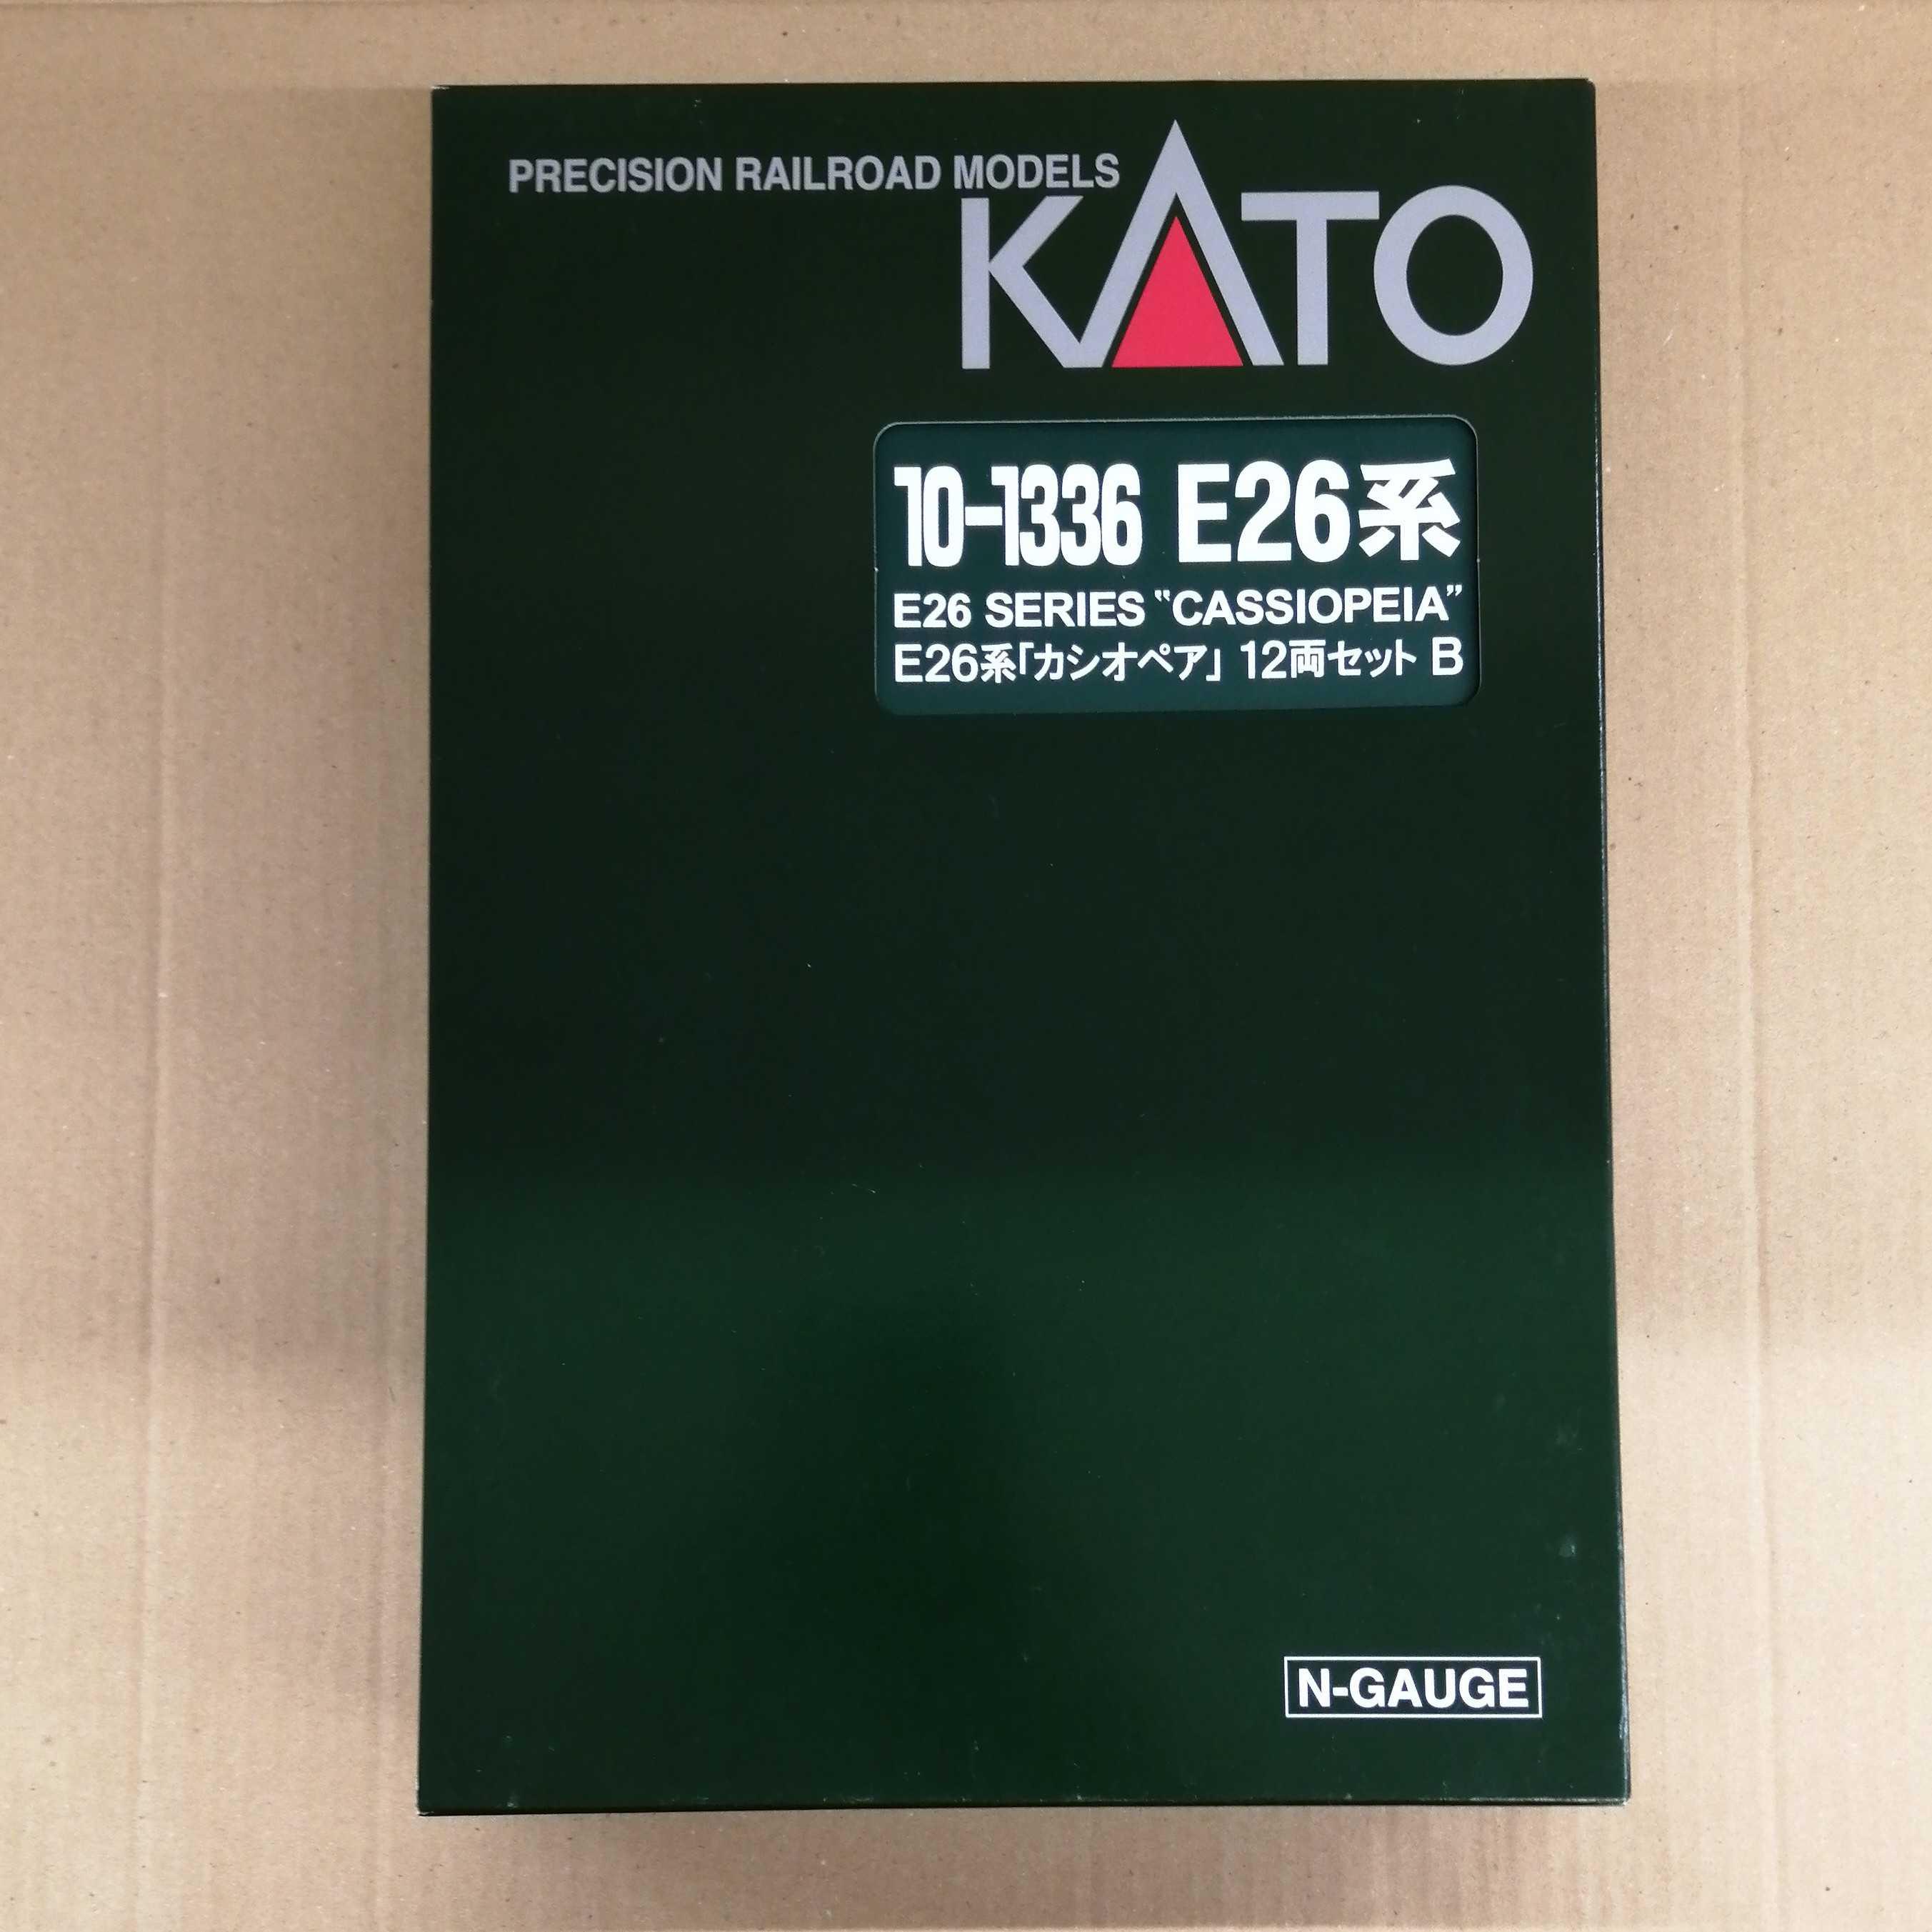 E26系「カシオペア」12両セット KATO